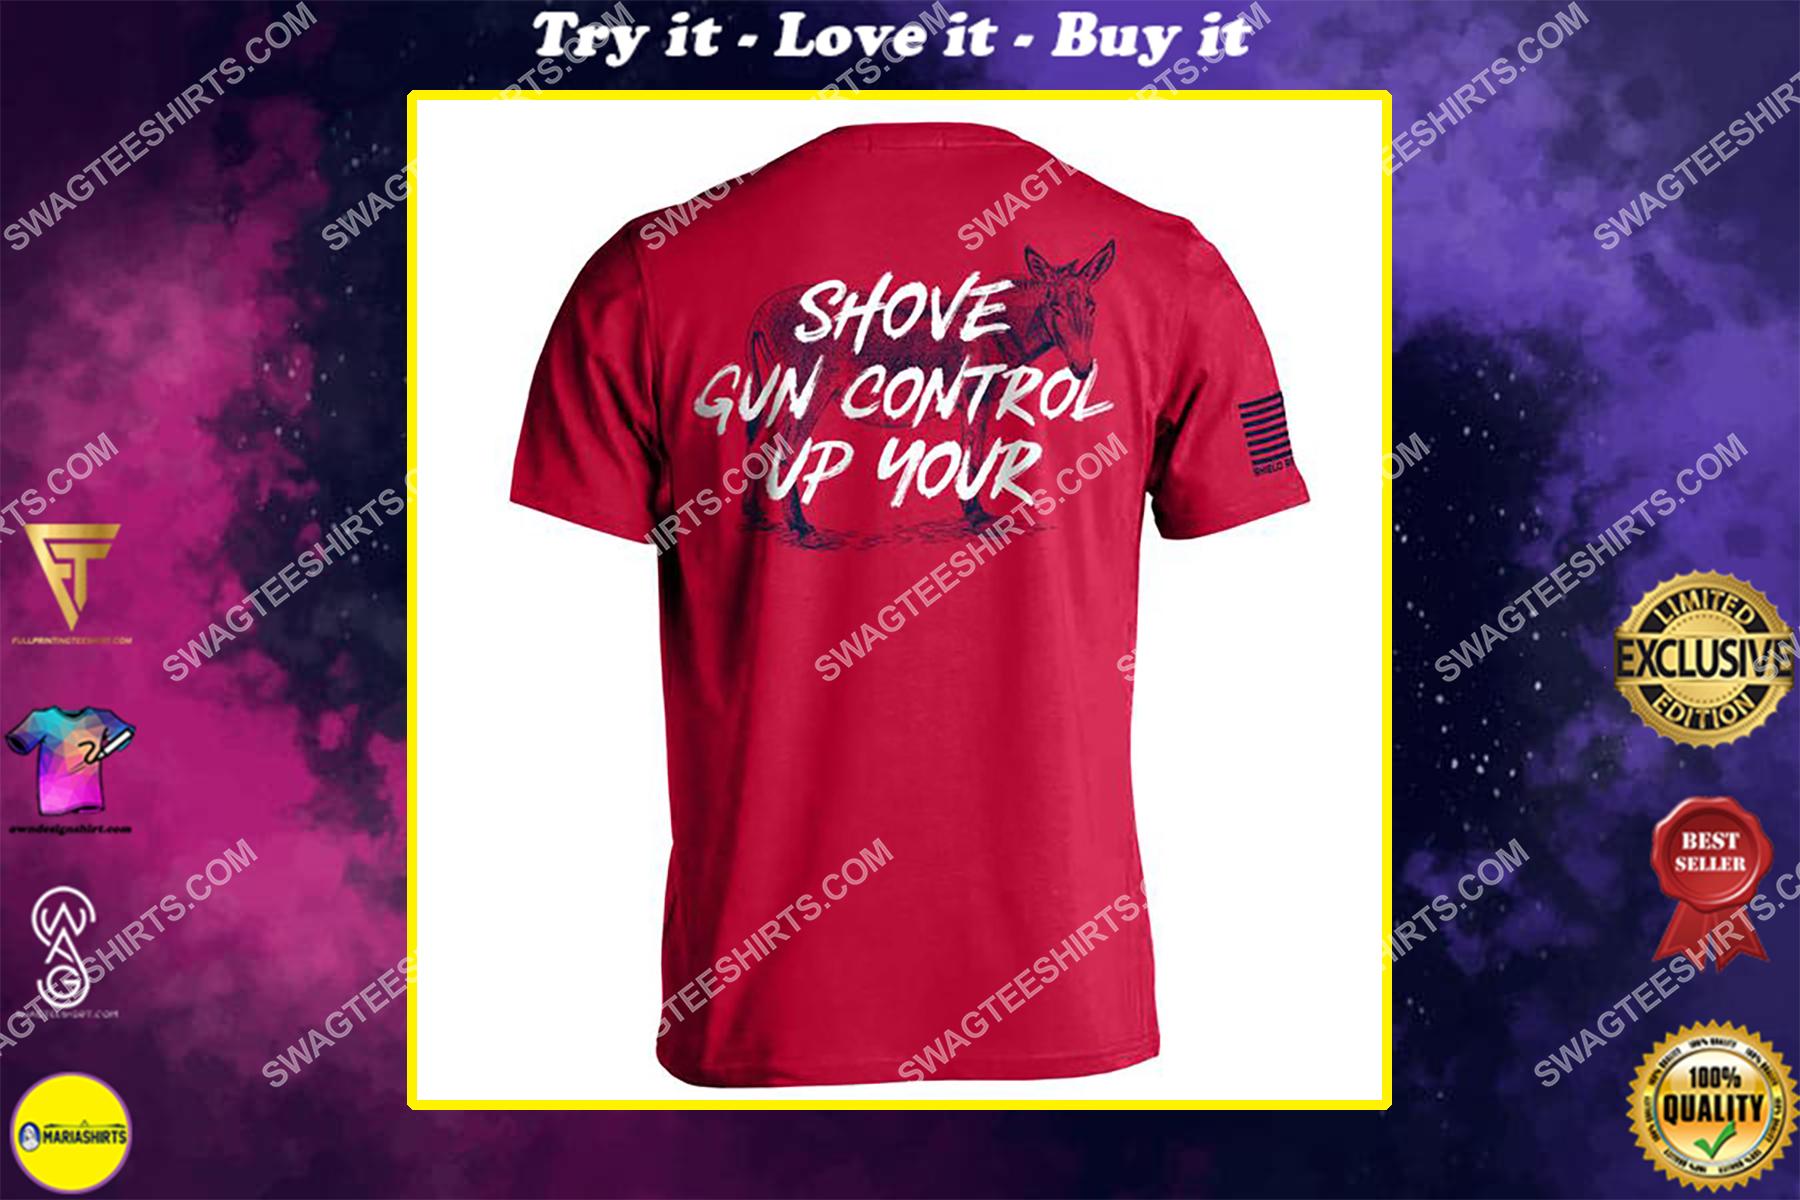 shove gun control up your political shirt